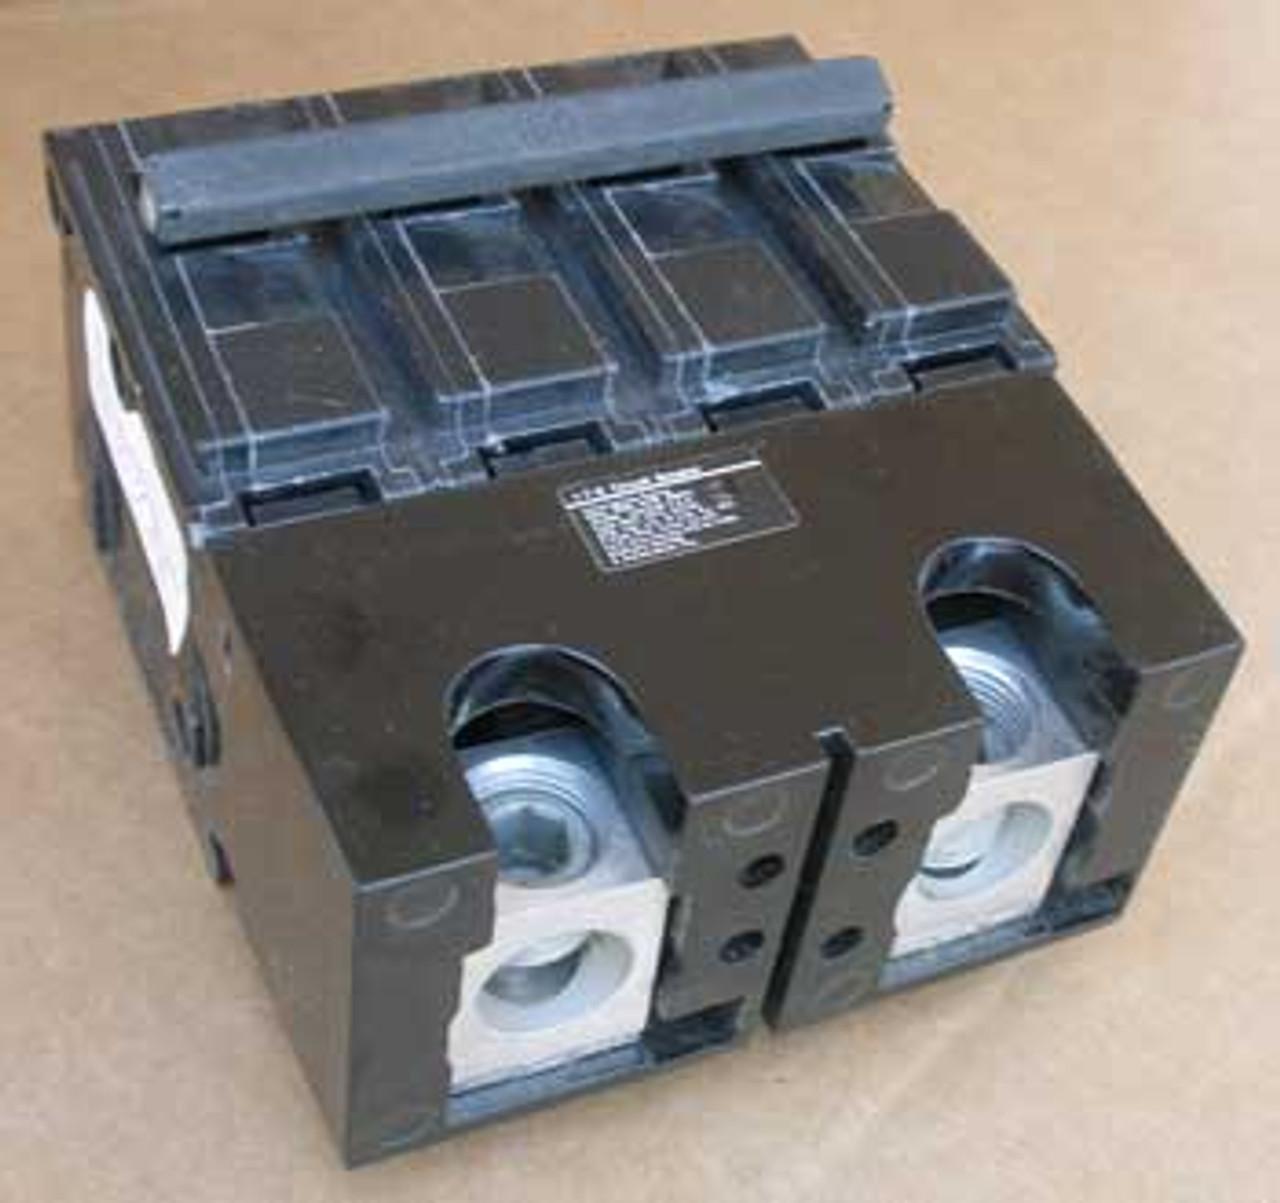 Murray MPP2150 2 Pole 150 Amp 240VAC Circuit Breaker - Used